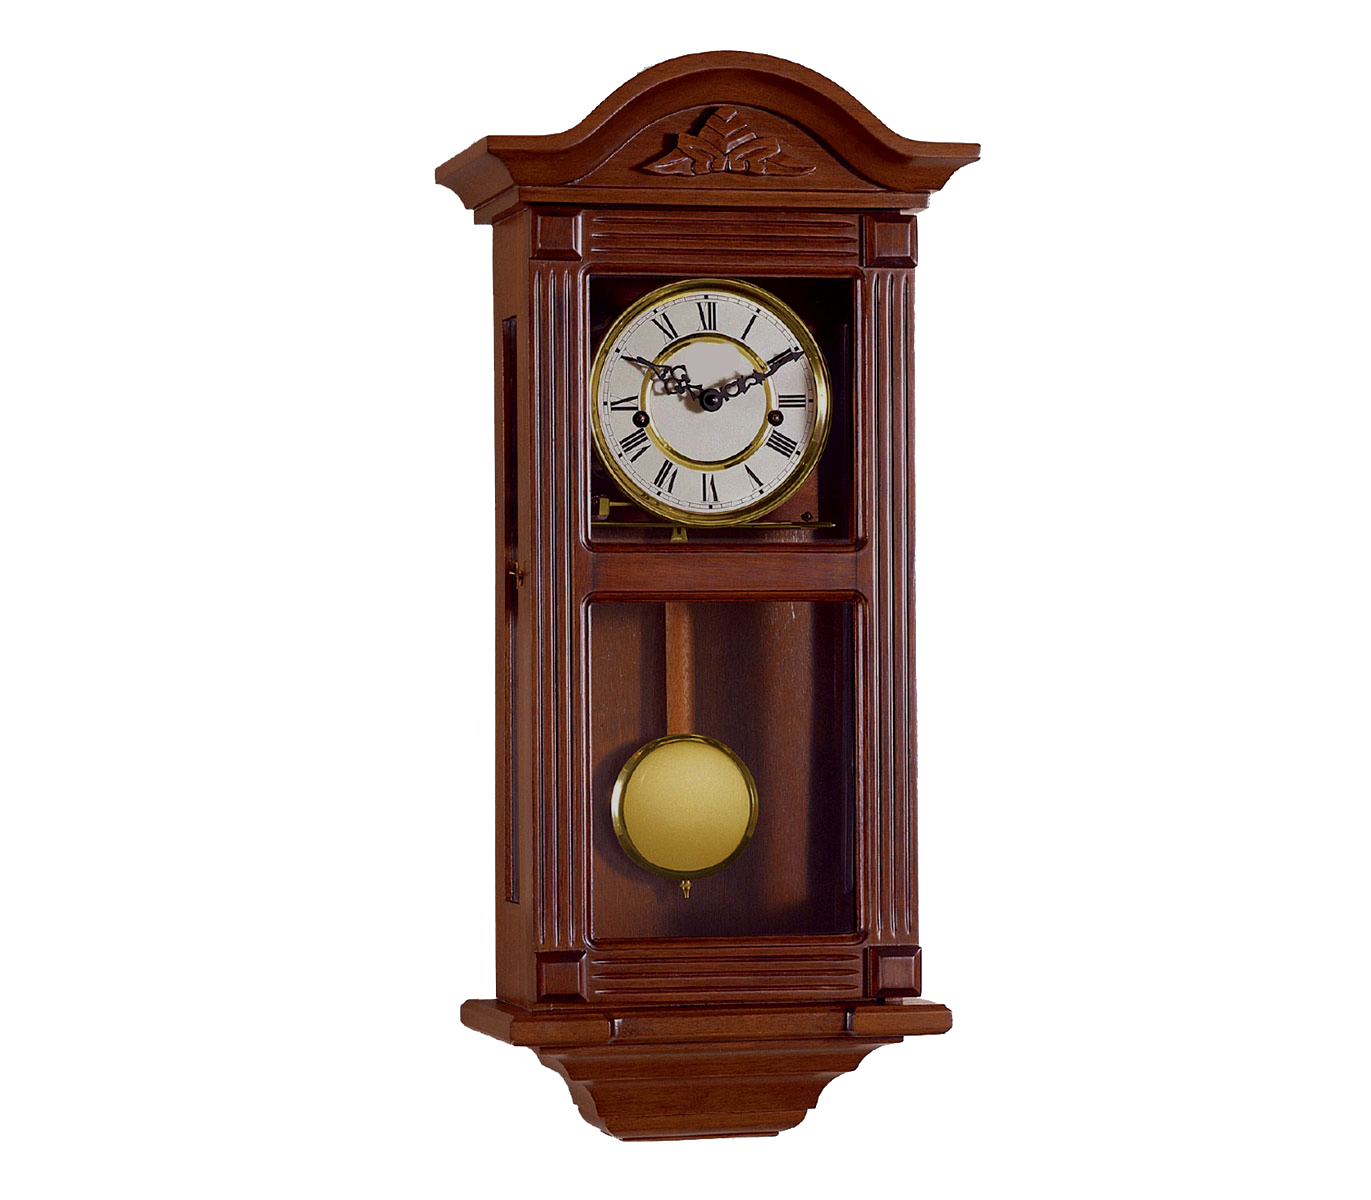 Reloj de pendulo de pared reloj con carrillon maquinaria - Relojes rusticos de pared ...